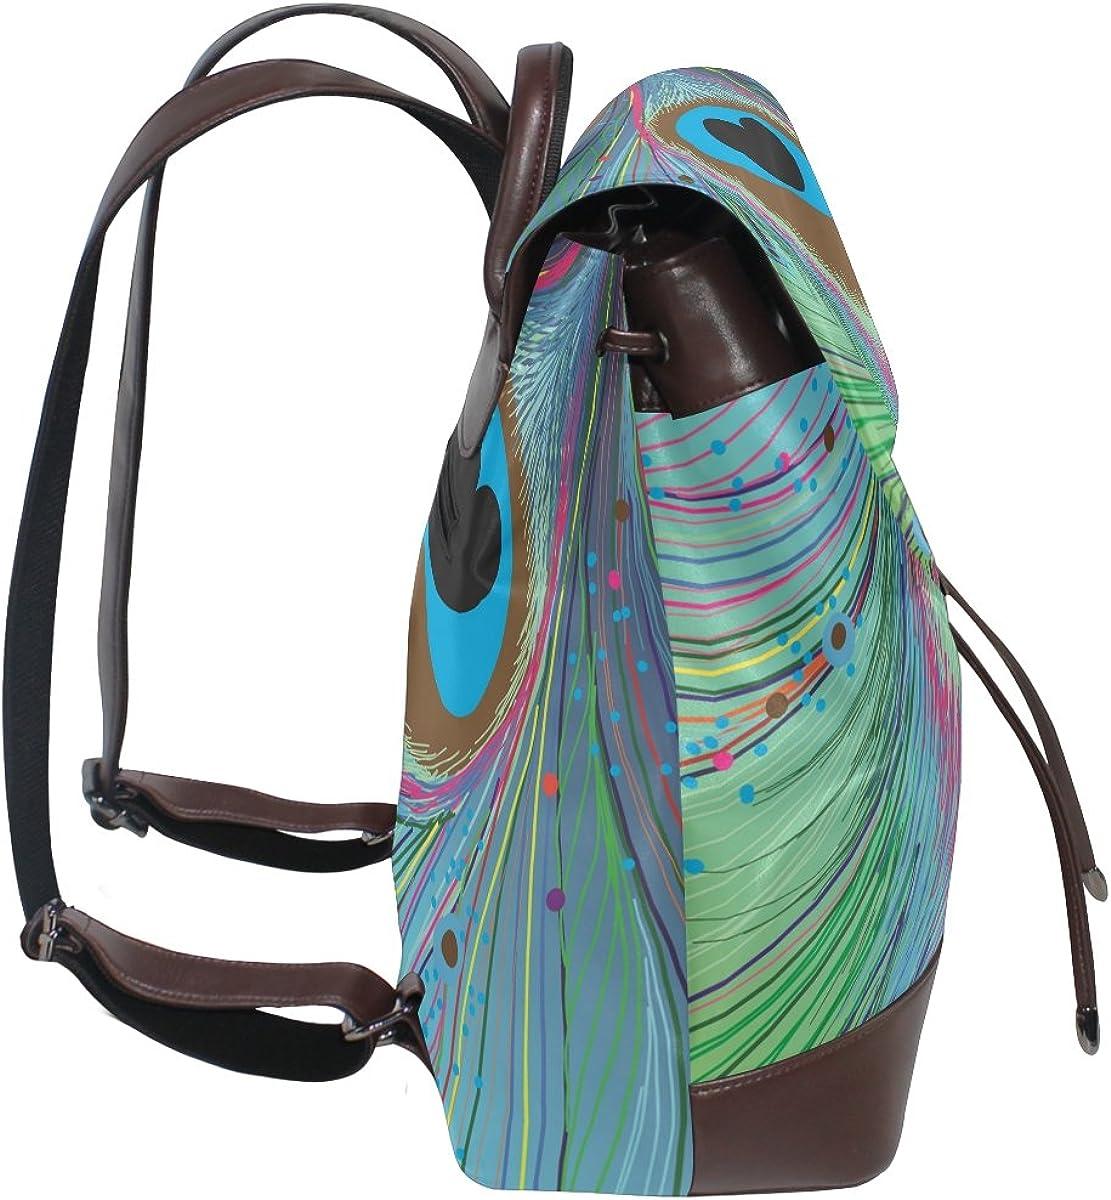 imobaby Japanese Style Blue Umbrella Pattern Changing Bags Large Capacity Handbags Canvas Shoulder Bag Backpack